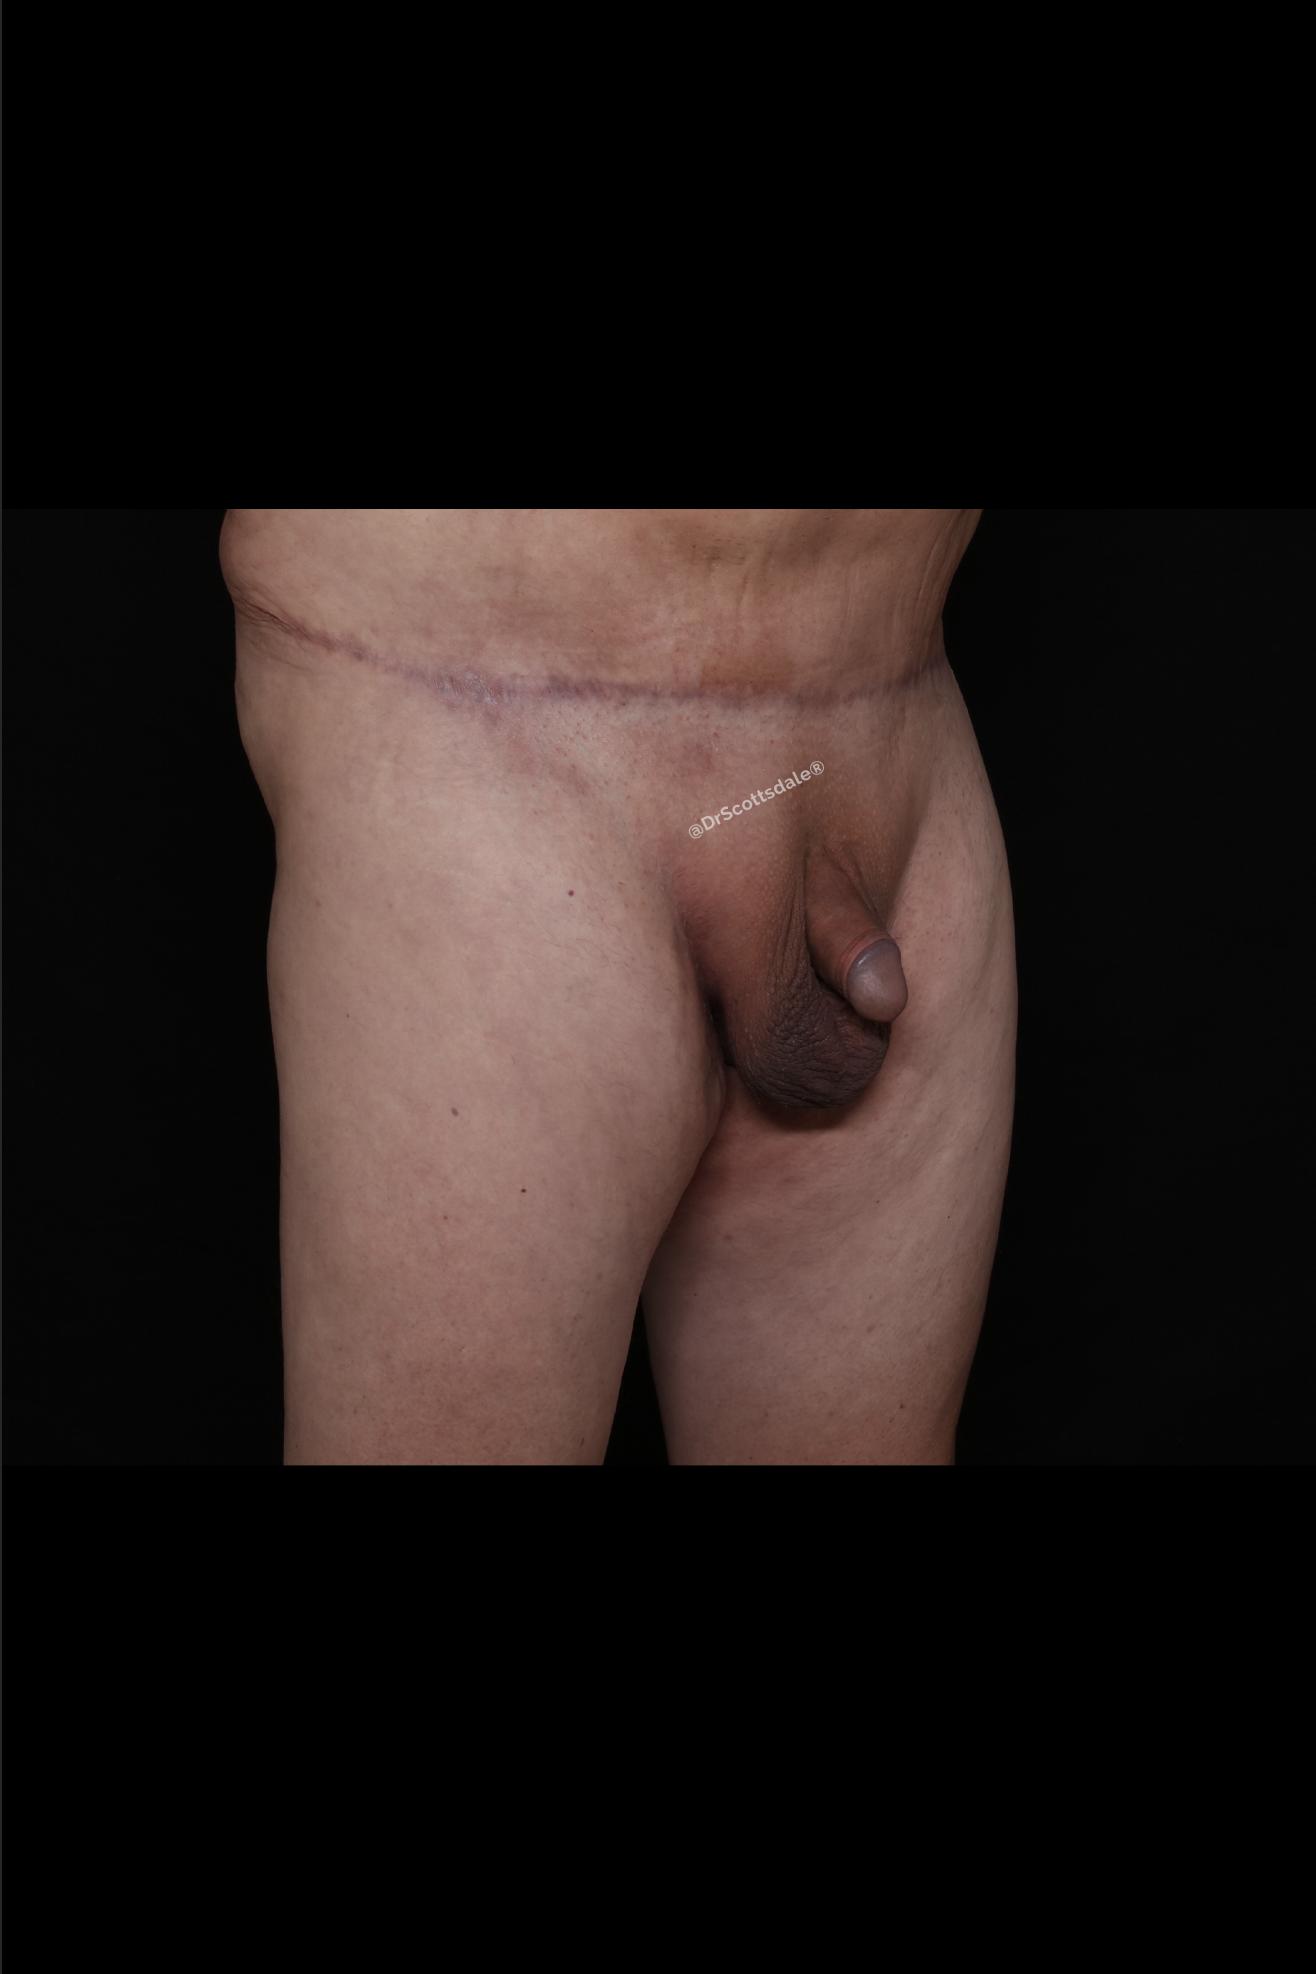 After Male Enhancement - Monsplasty & Tummy Tuck